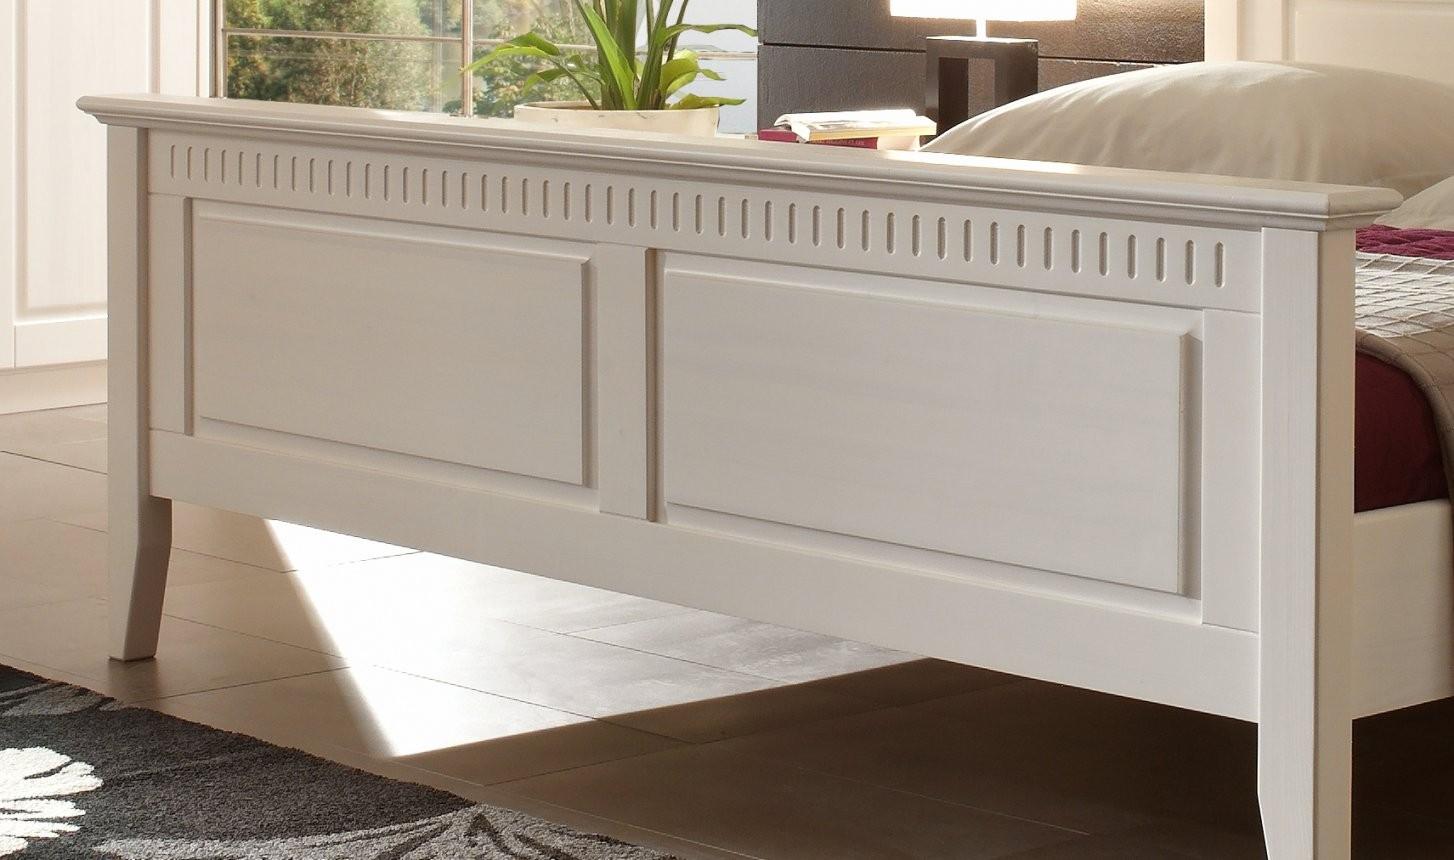 Bett  Doppelbett Bolzano8 Kiefer Massiv Weiß Lasiert 180 X 200 Cm von Bett Holz Weiß 180X200 Photo